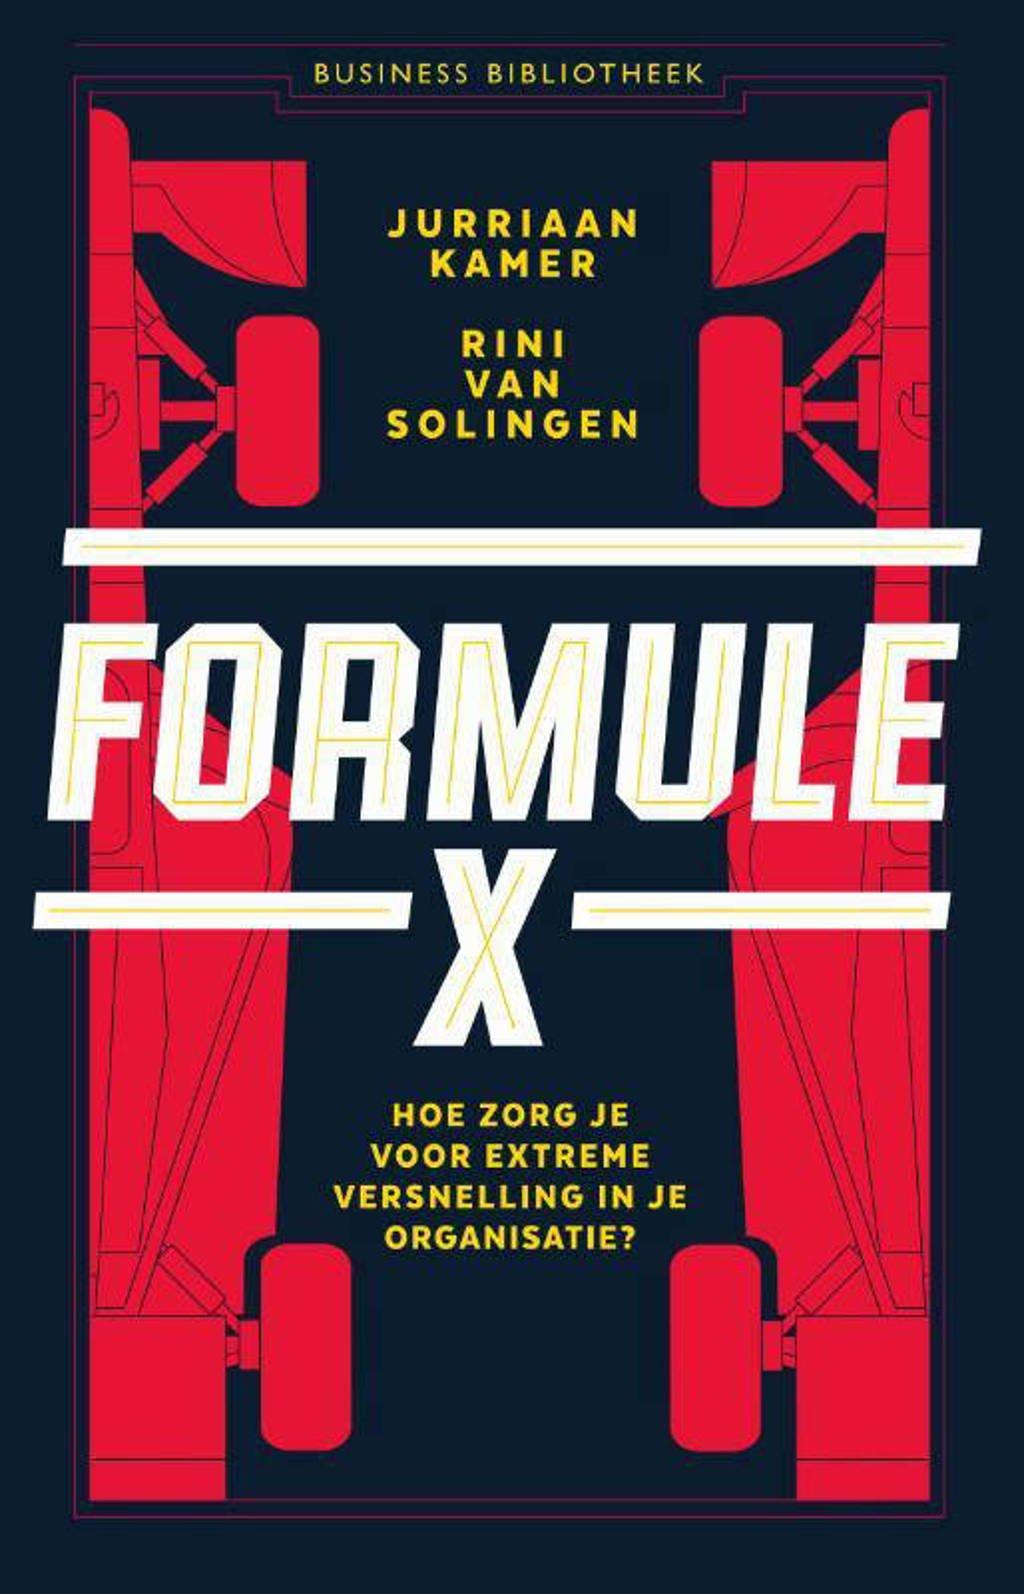 Formule X - Jurriaan Kamer en Rini van Solingen